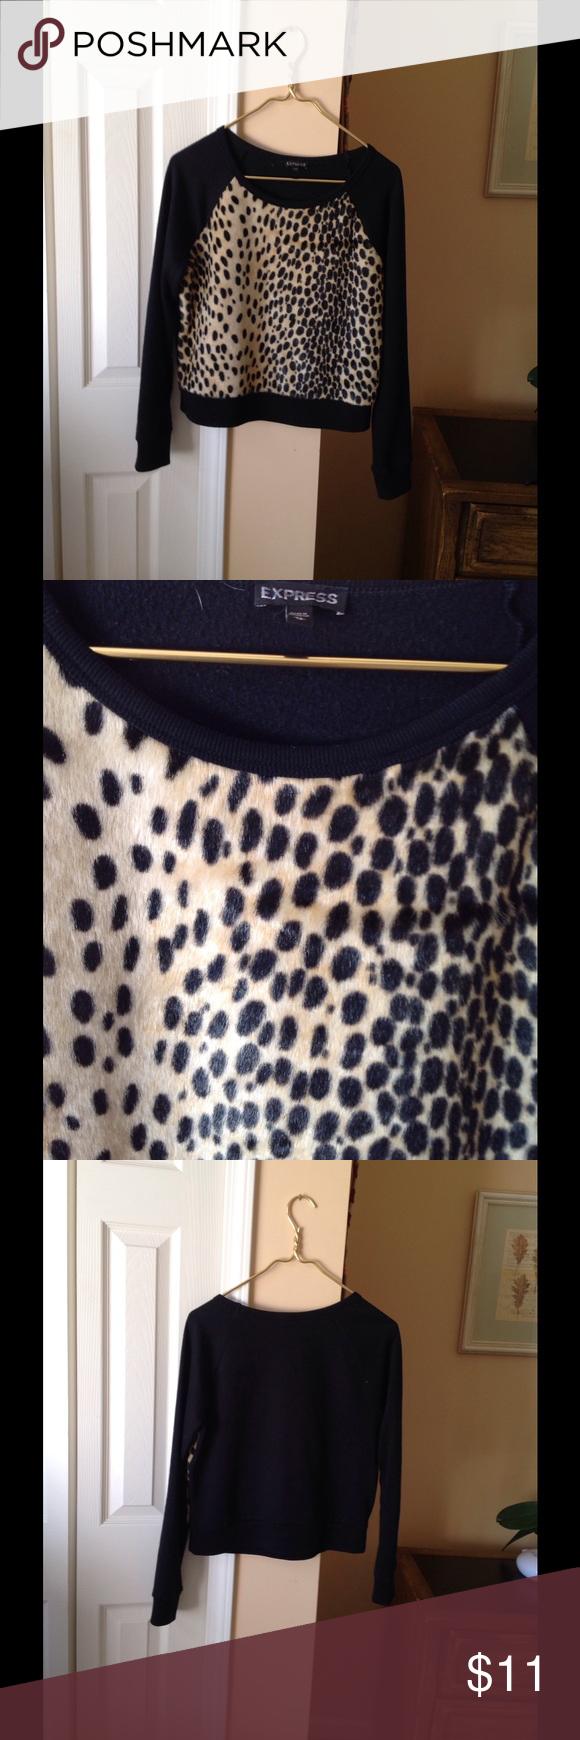 Express Leopard Sweatshirt Cute leopard print sweatshirt with fuzzy leopard front panel. Excellent used condition. Express Tops Sweatshirts & Hoodies